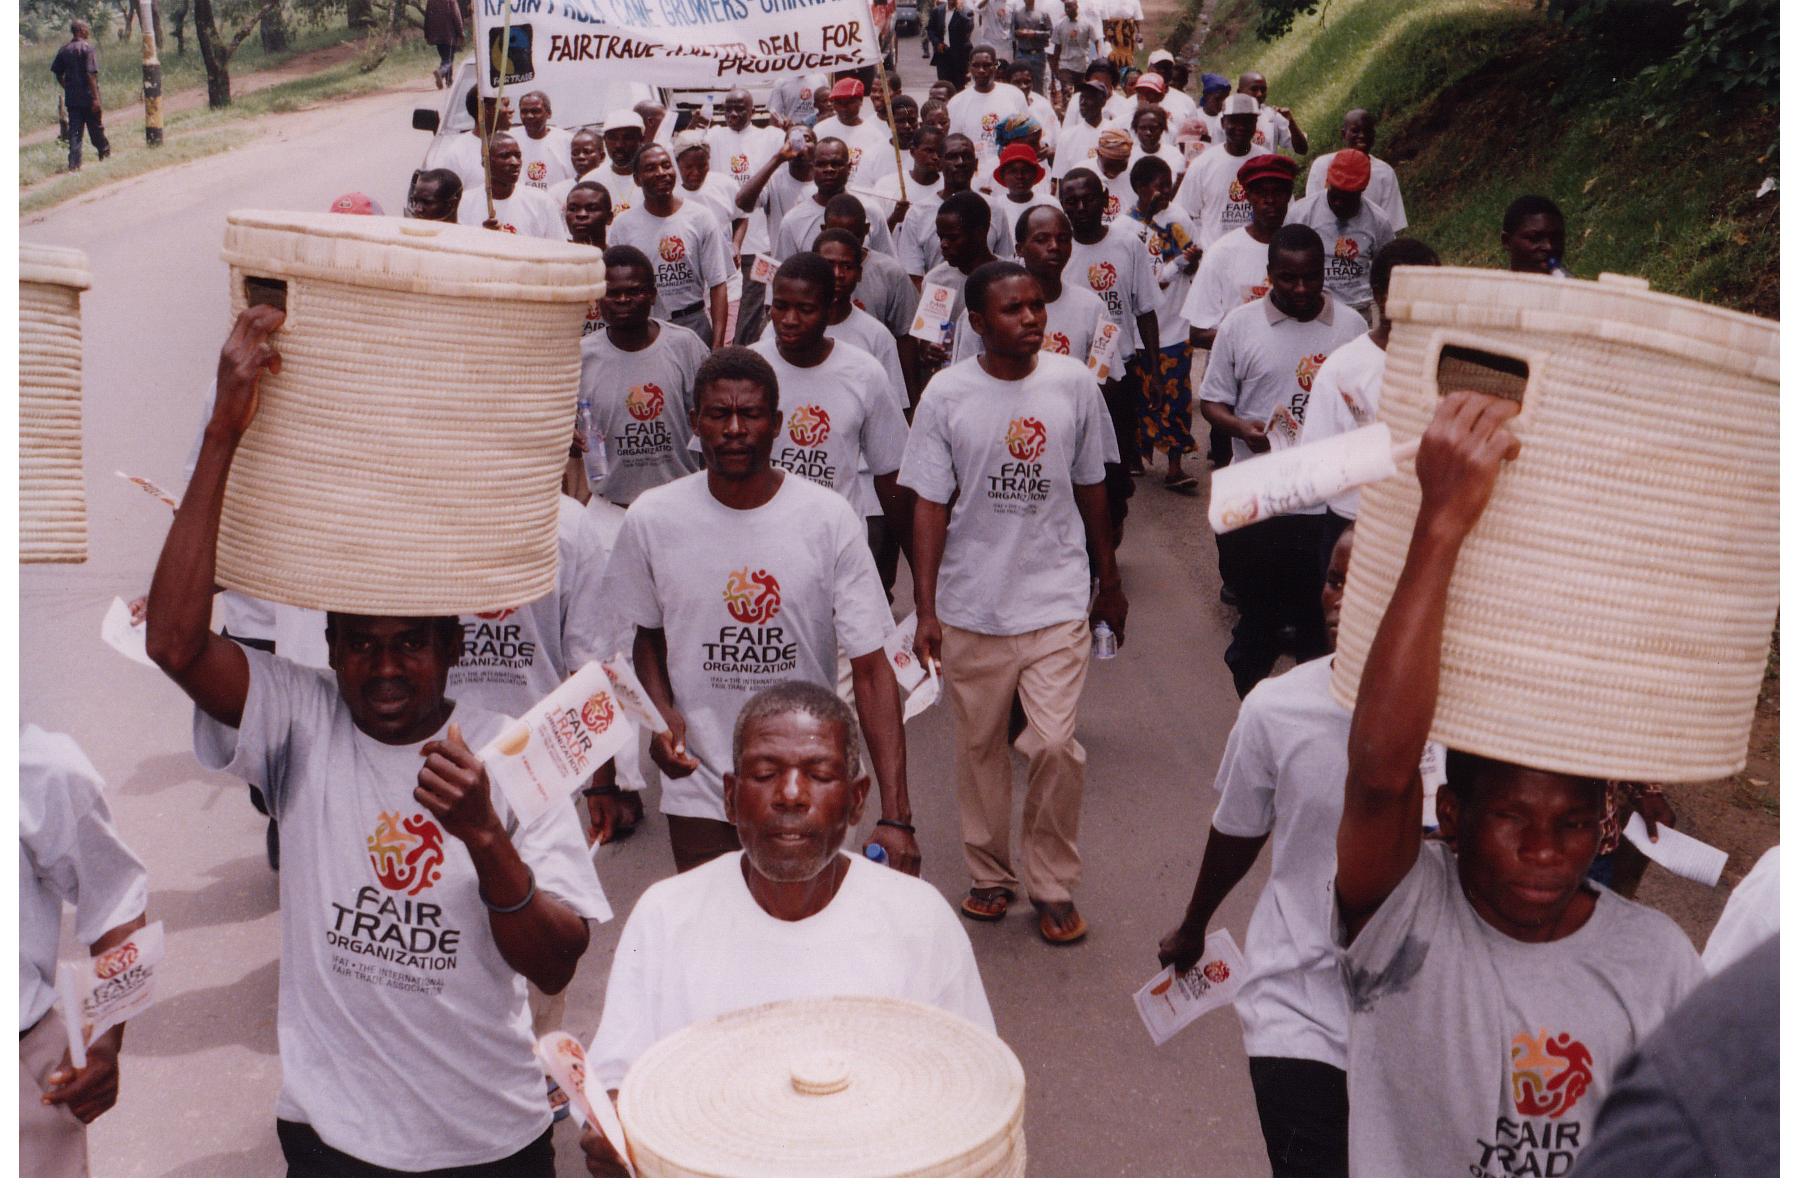 History of Fair Trade | World Fair Trade Organization